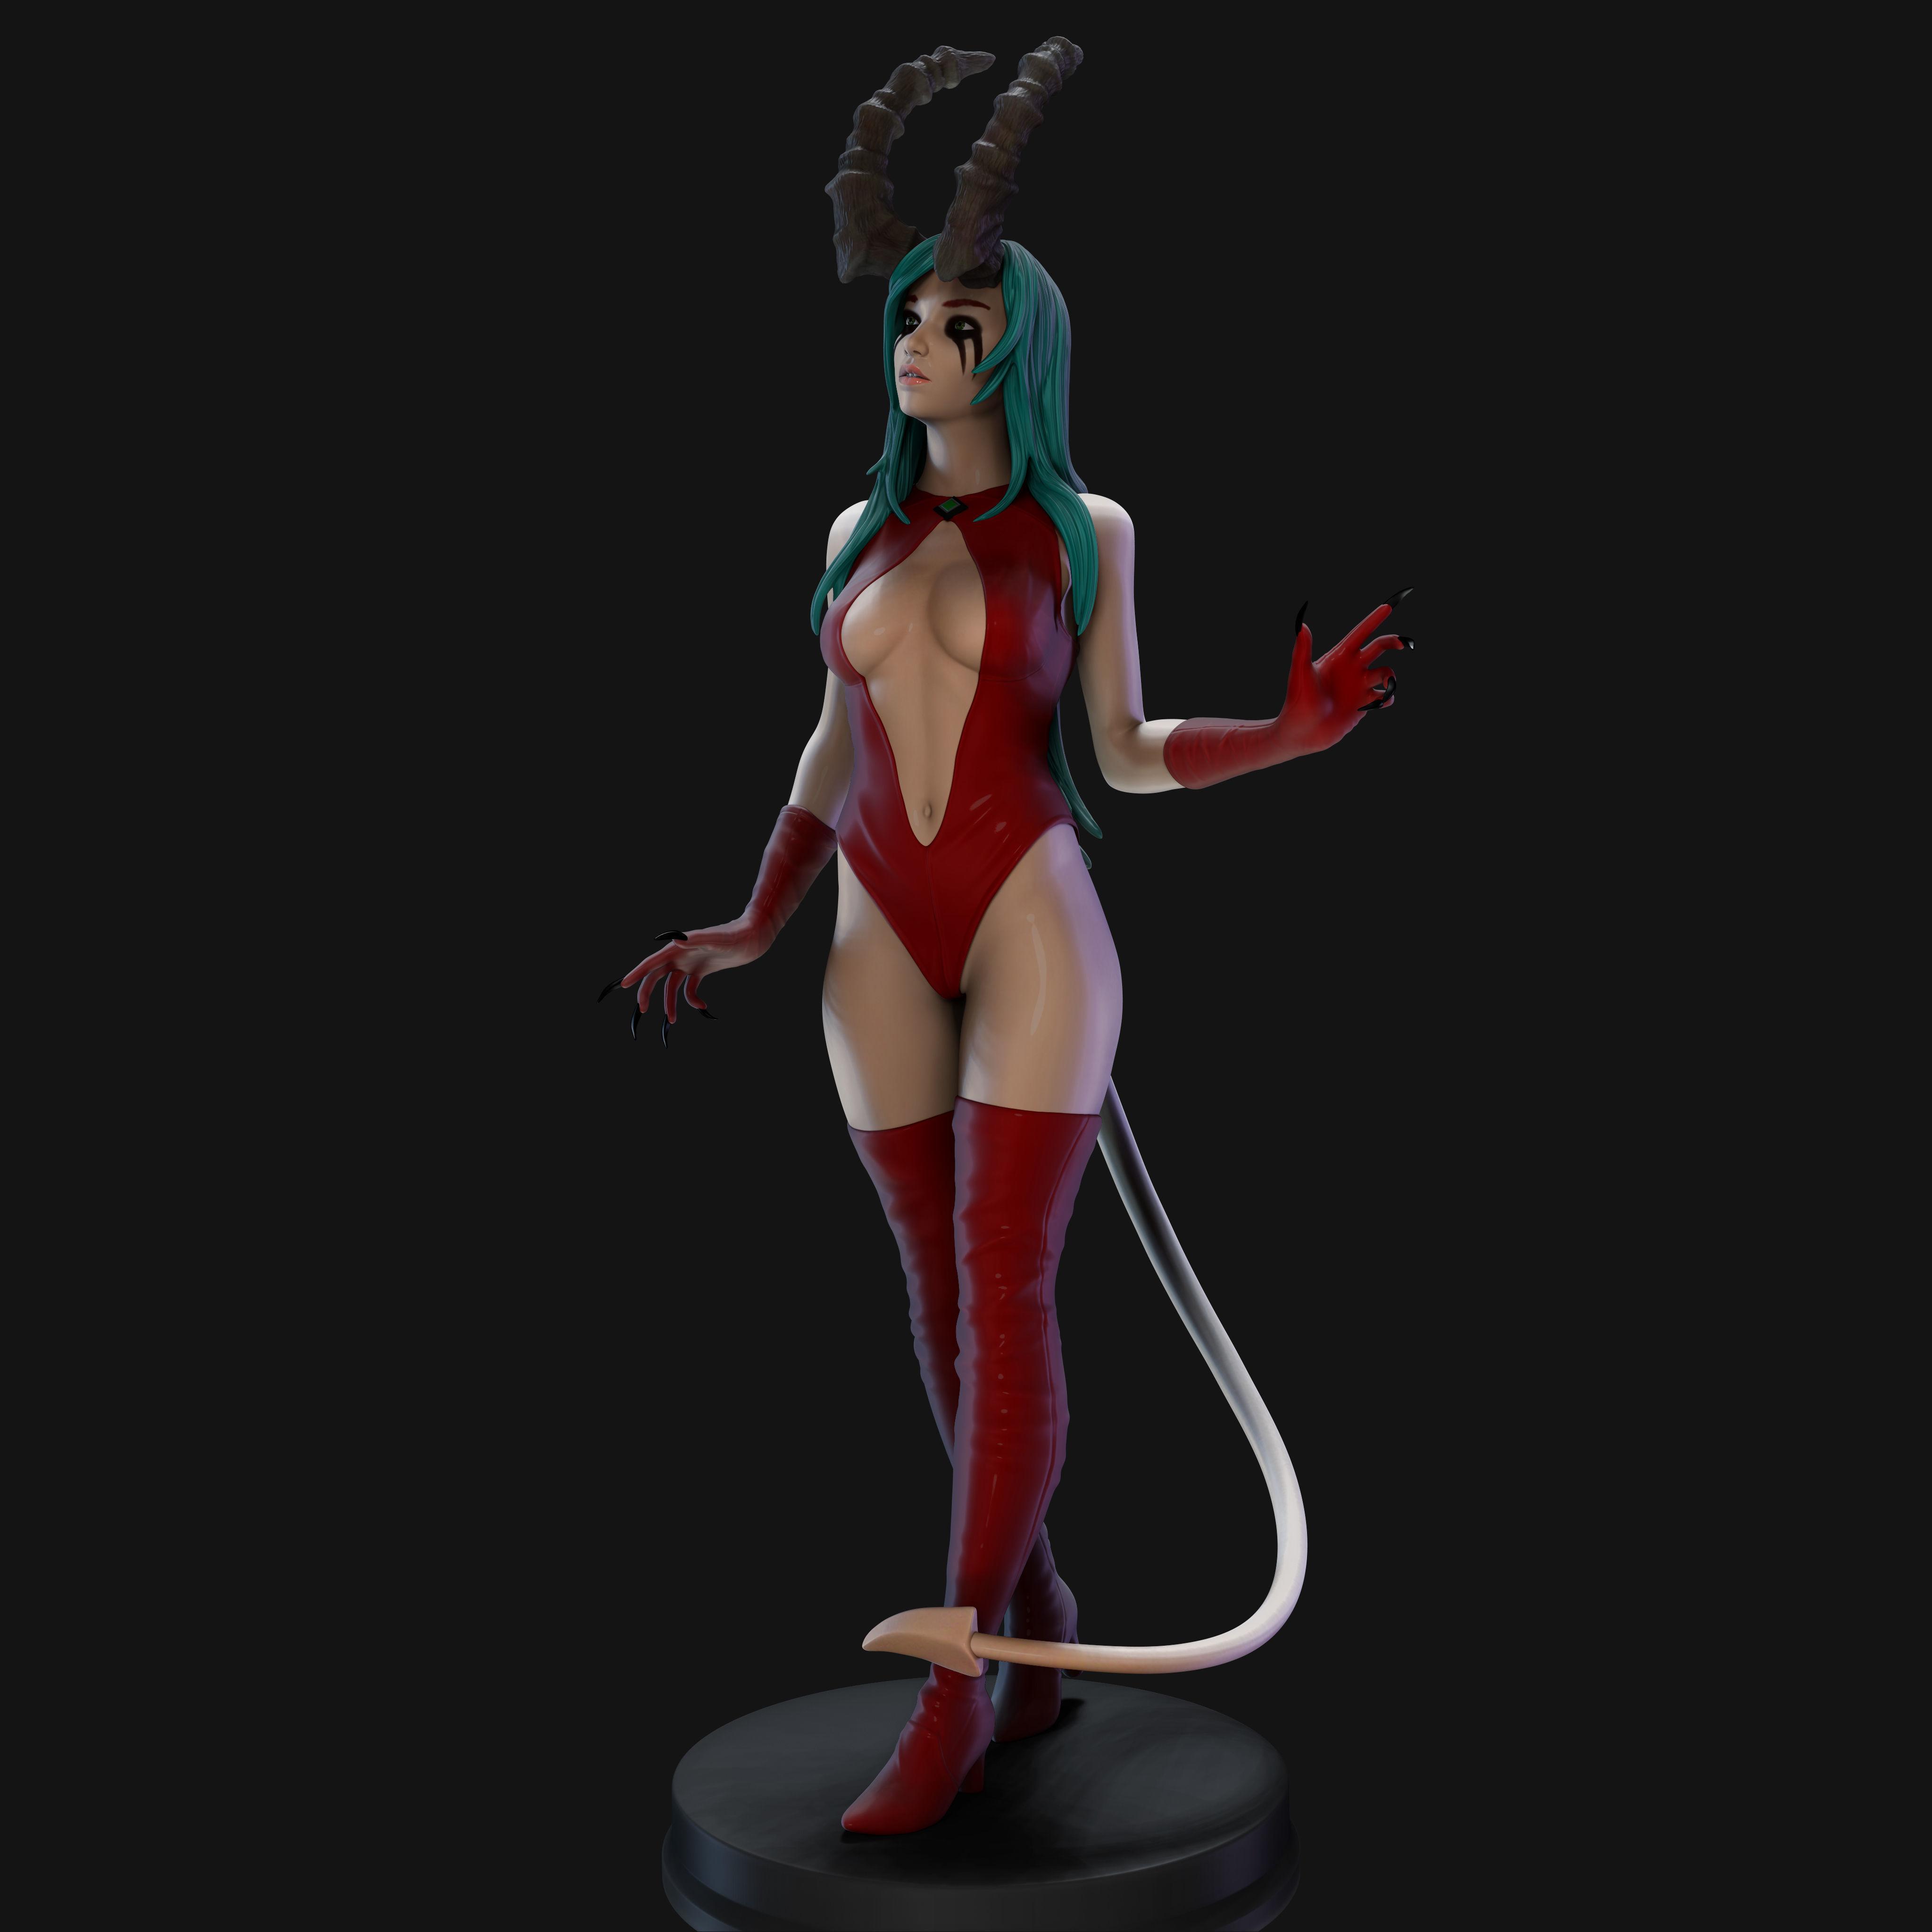 Demon Lady 3D Print Model 25cm